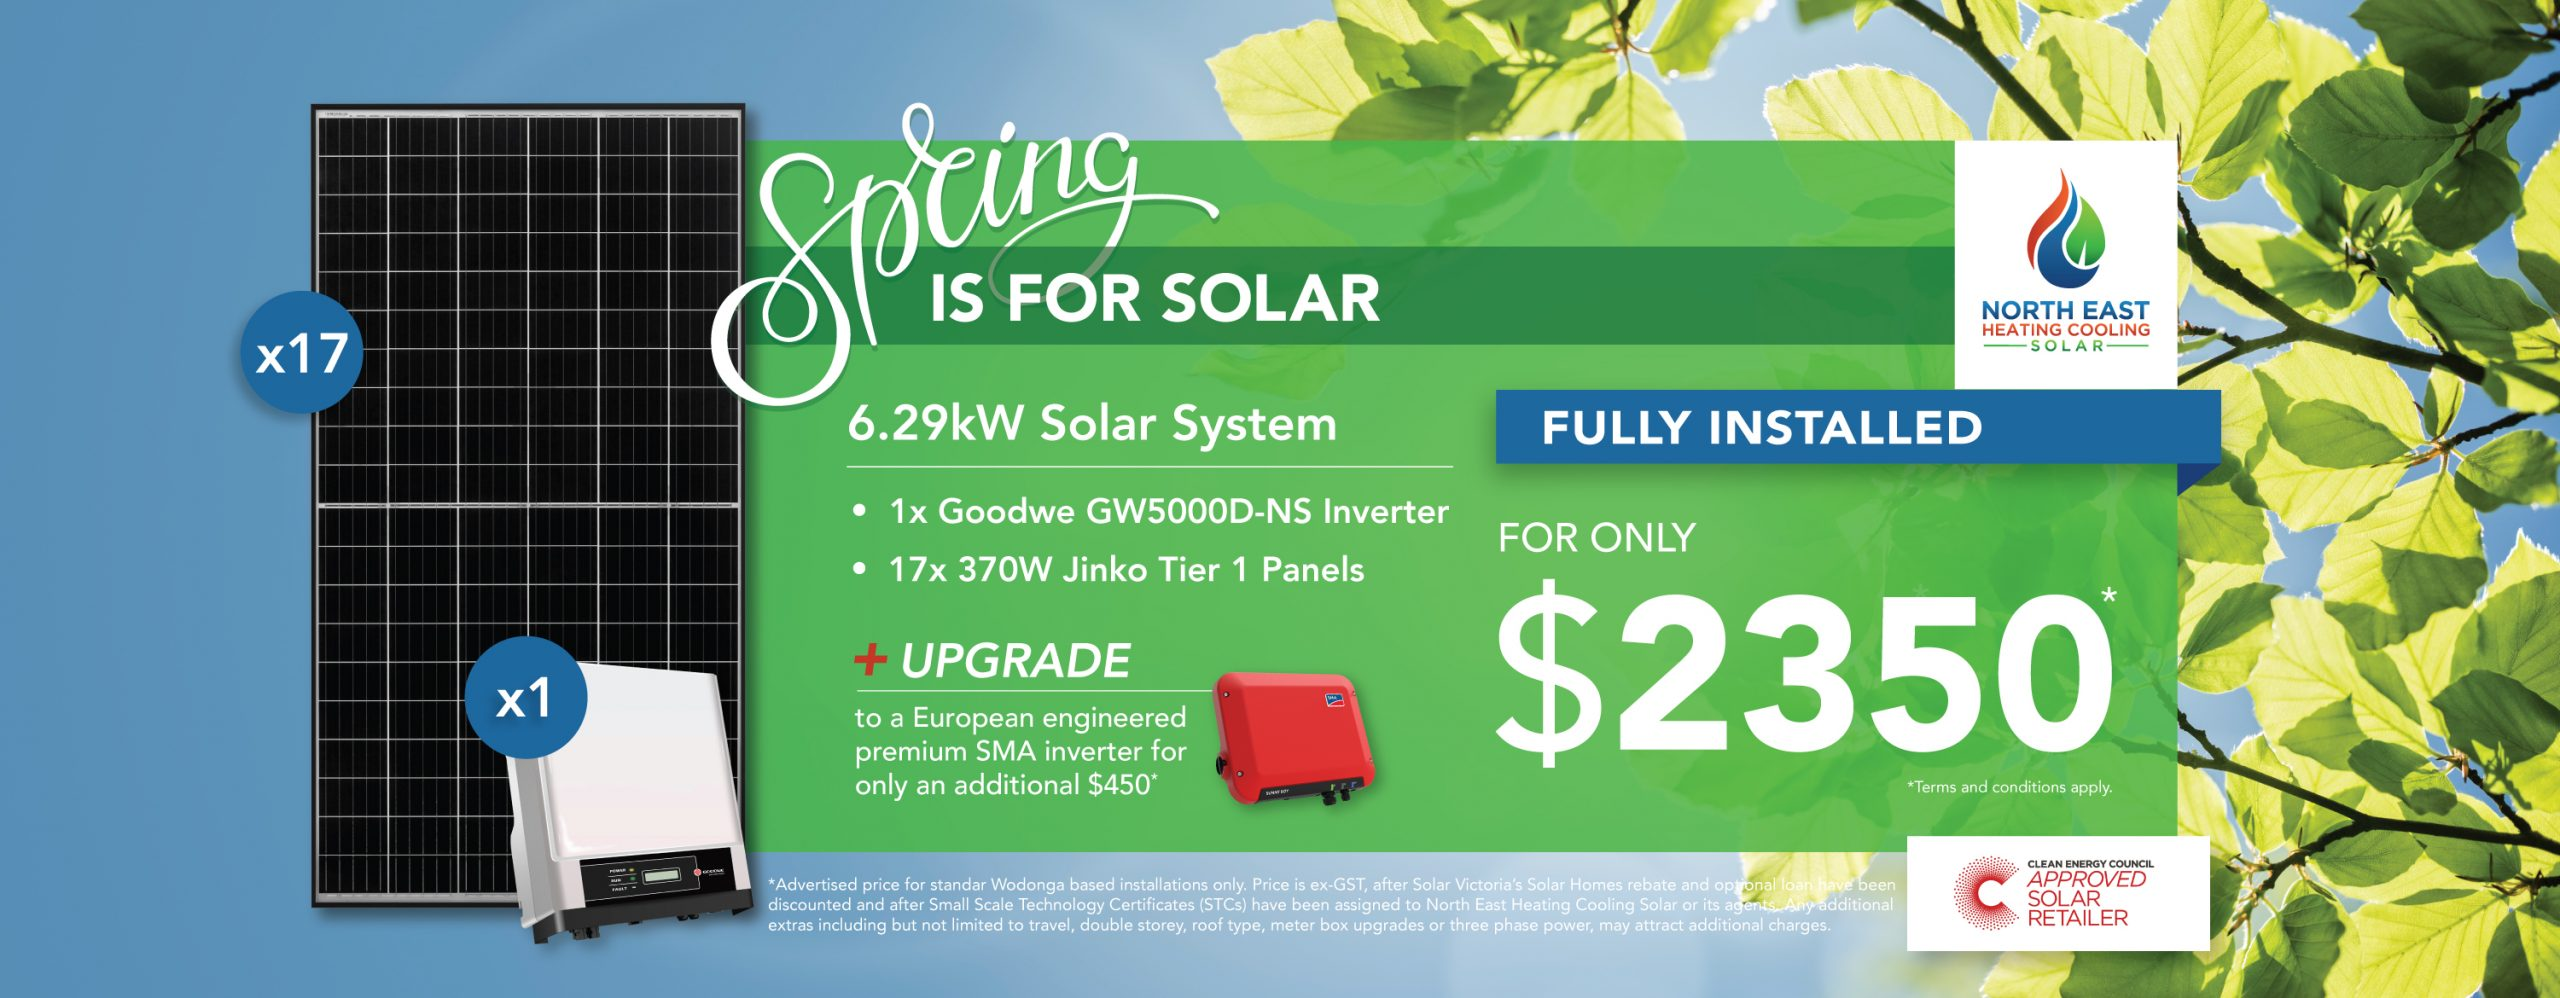 https://www.northeastheatcool.com.au/wp-content/uploads/2021/09/Spring-Solar-Promo-21_NEBanner_NEW-scaled.jpg